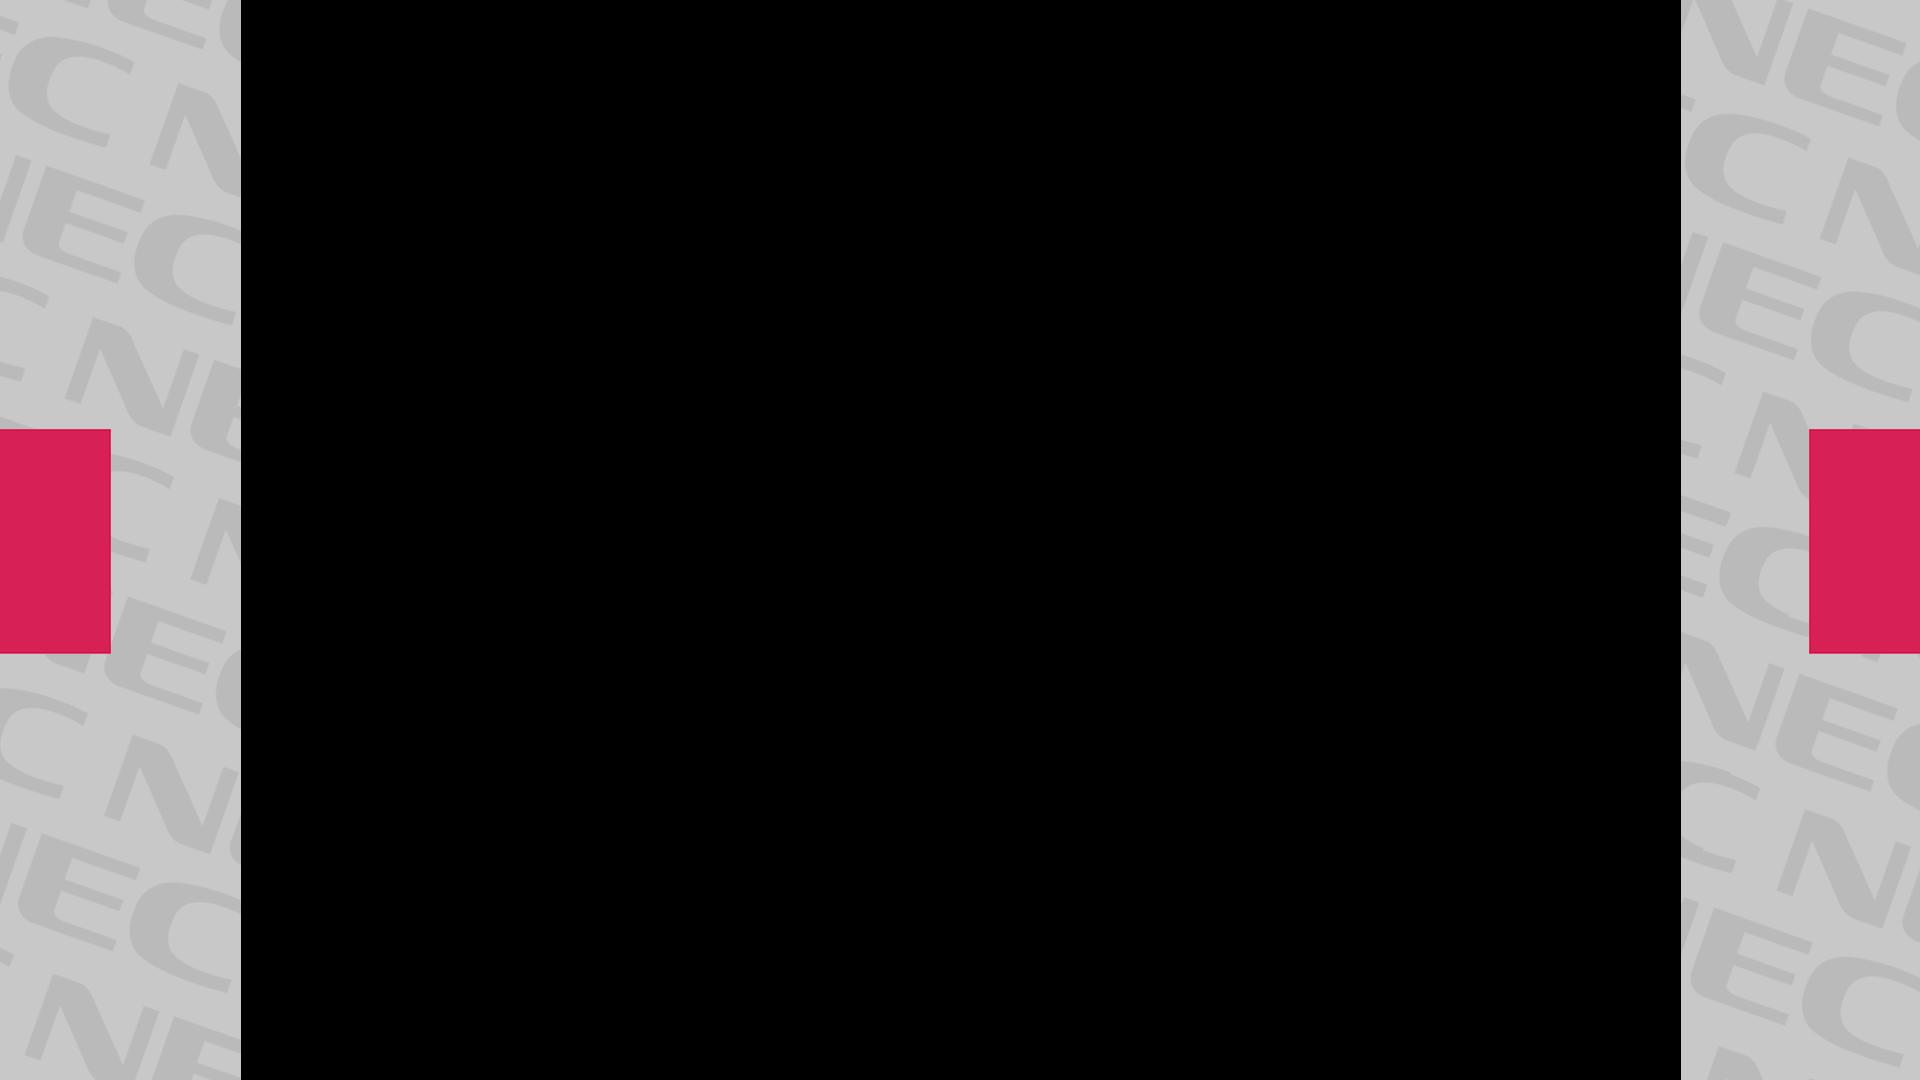 5aefd57aa86ef_NECPC-FX.png.85cf175e1f4dc343fc35a386fa7fca66.png